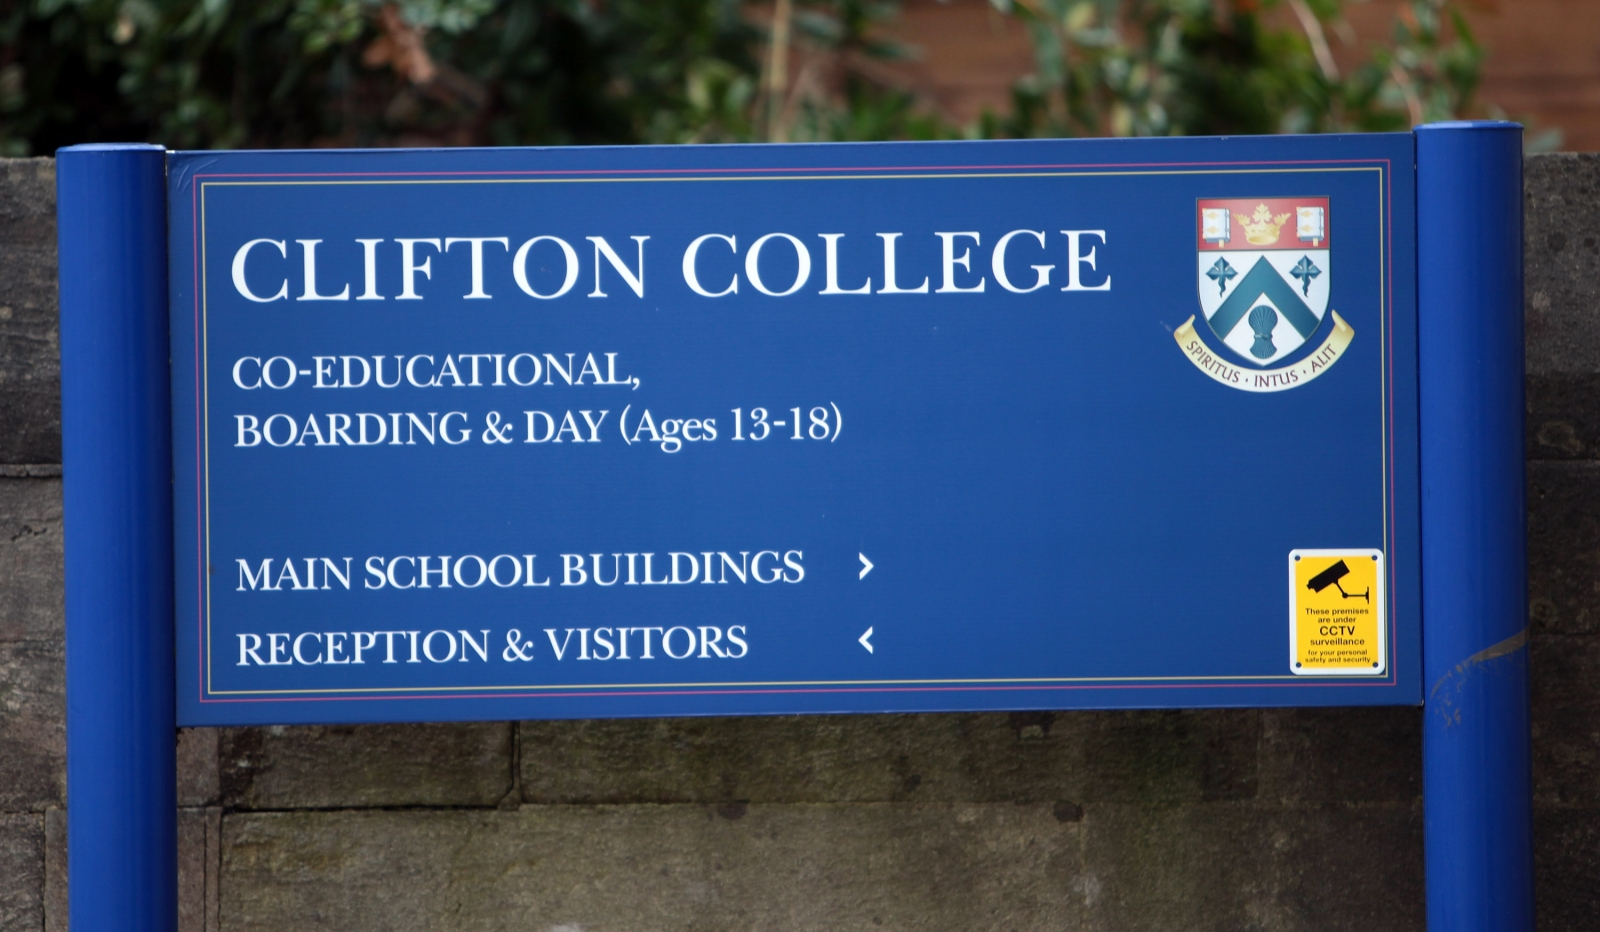 A former teacher at Clifton College, Bristol